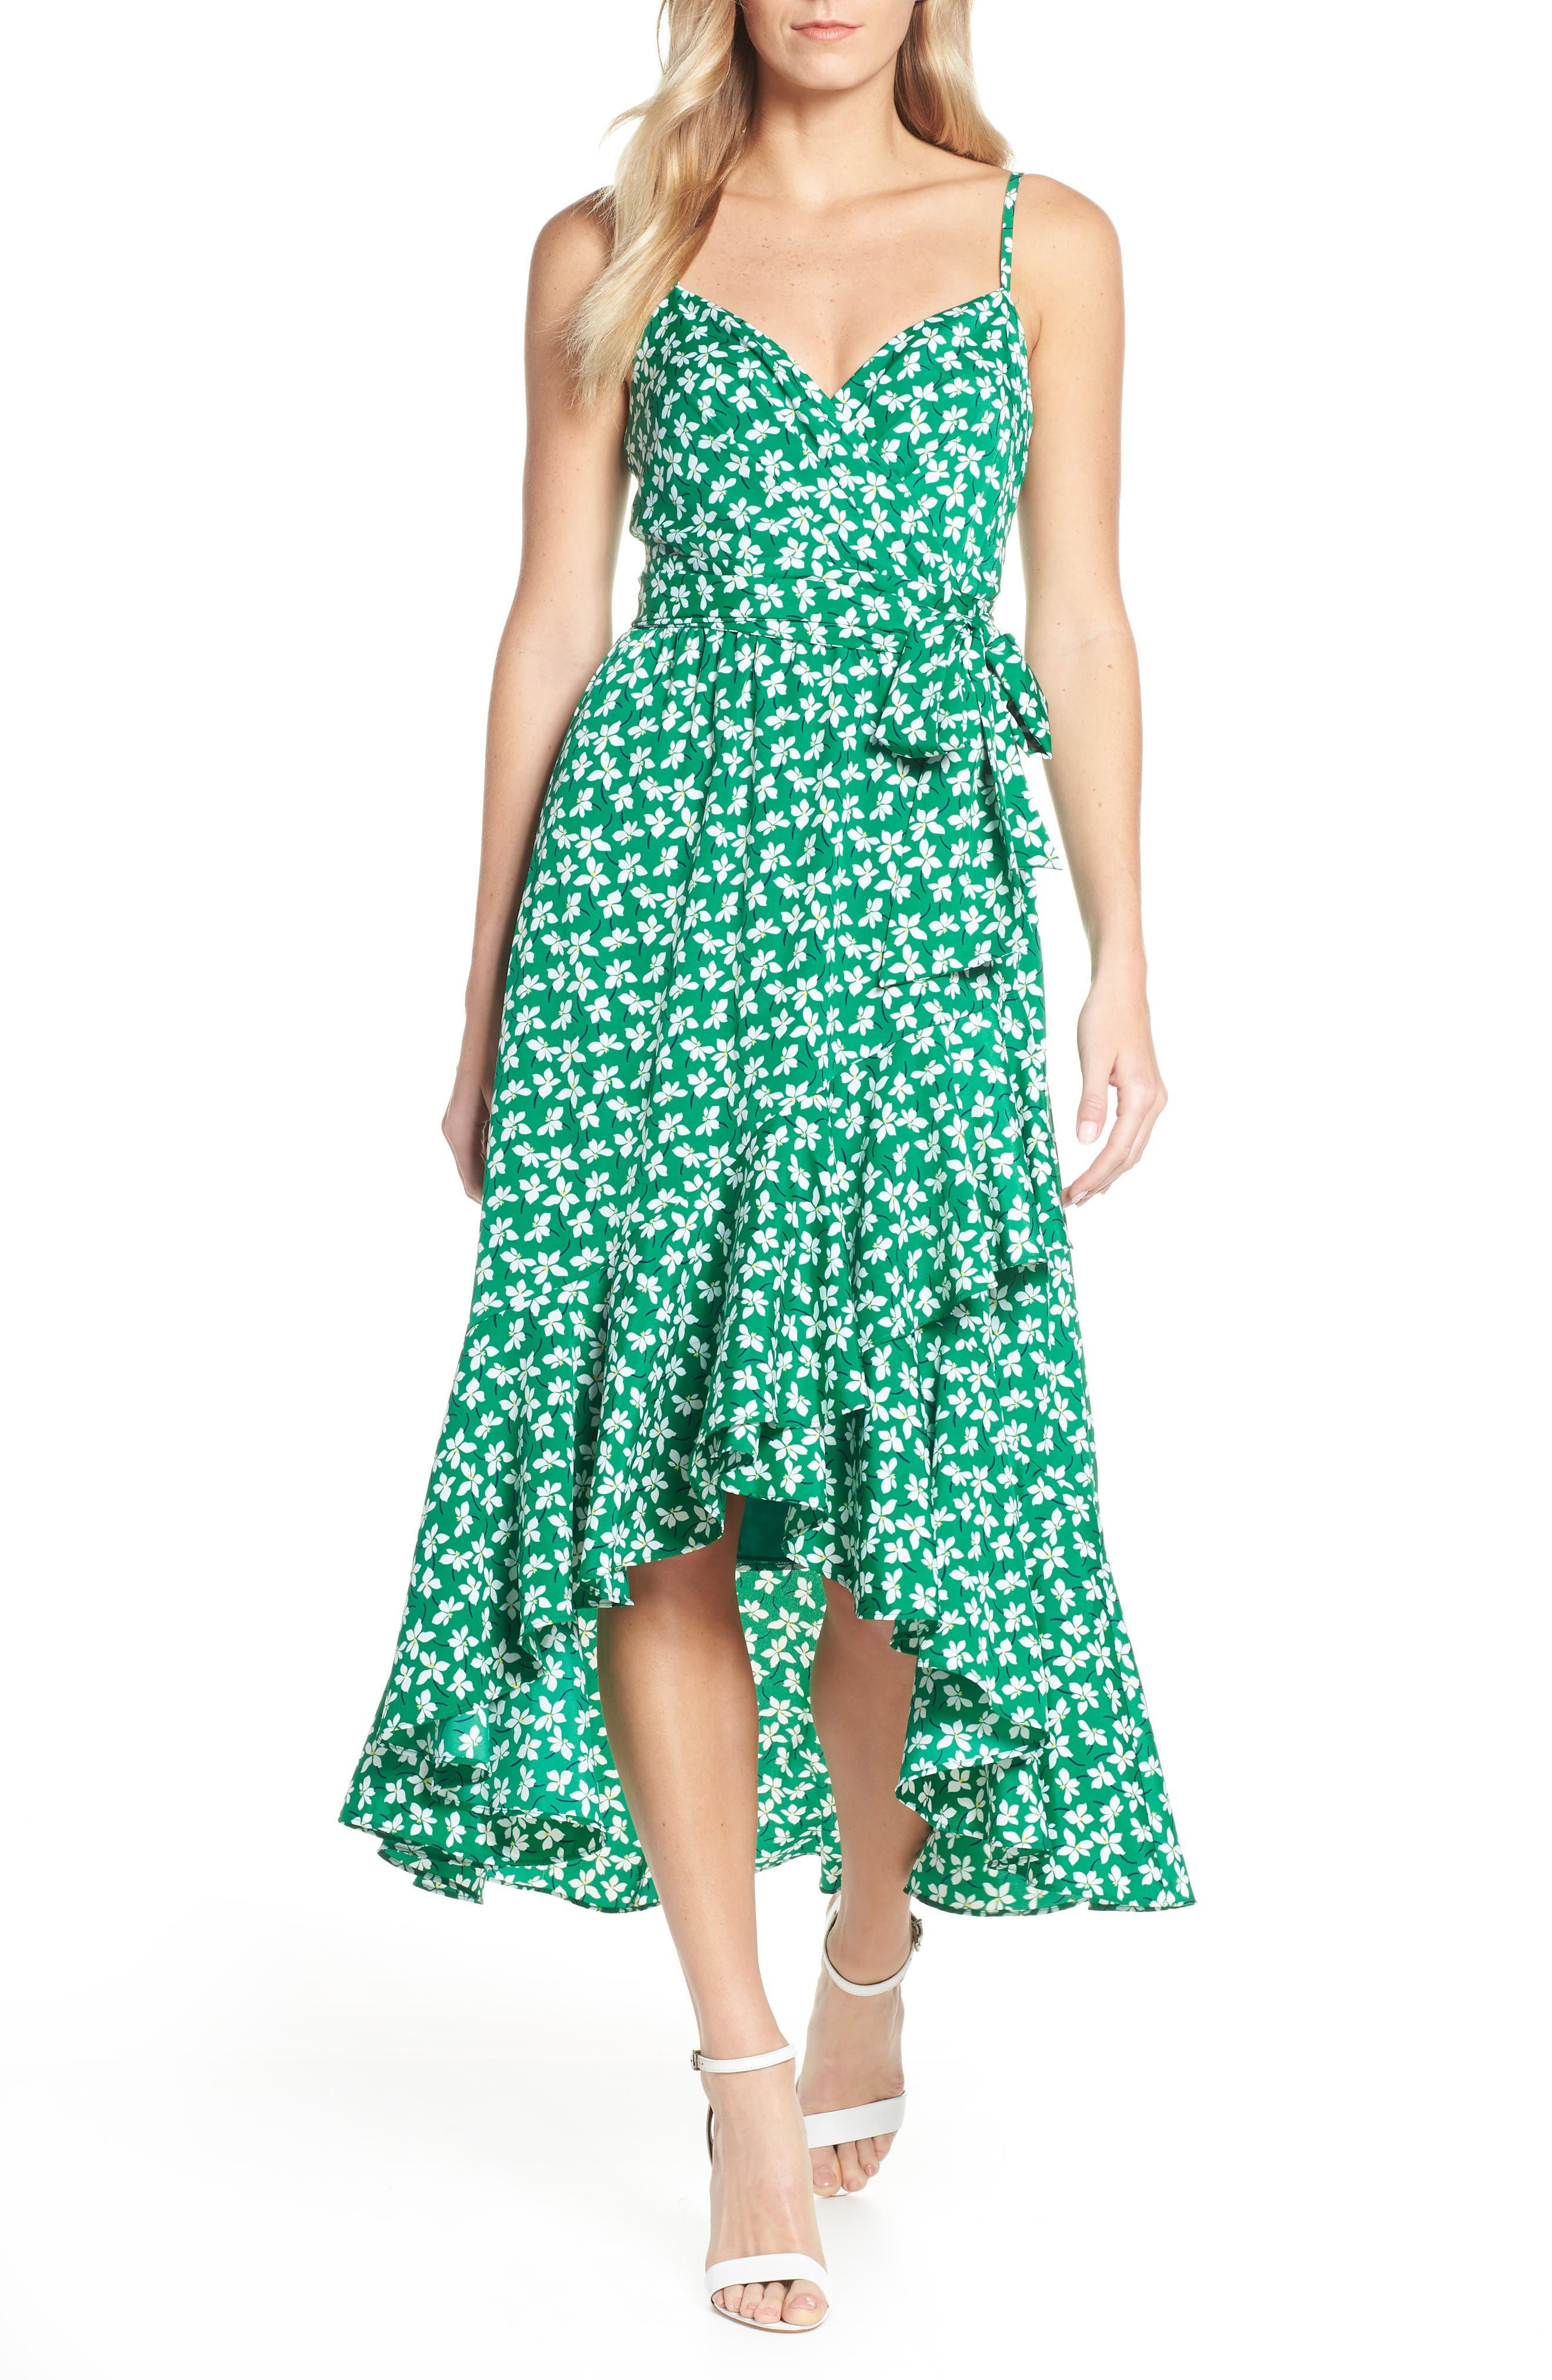 ELIZA J, Floral High/Low Faux Wrap Dress, Main thumbnail 1, color, GREEN